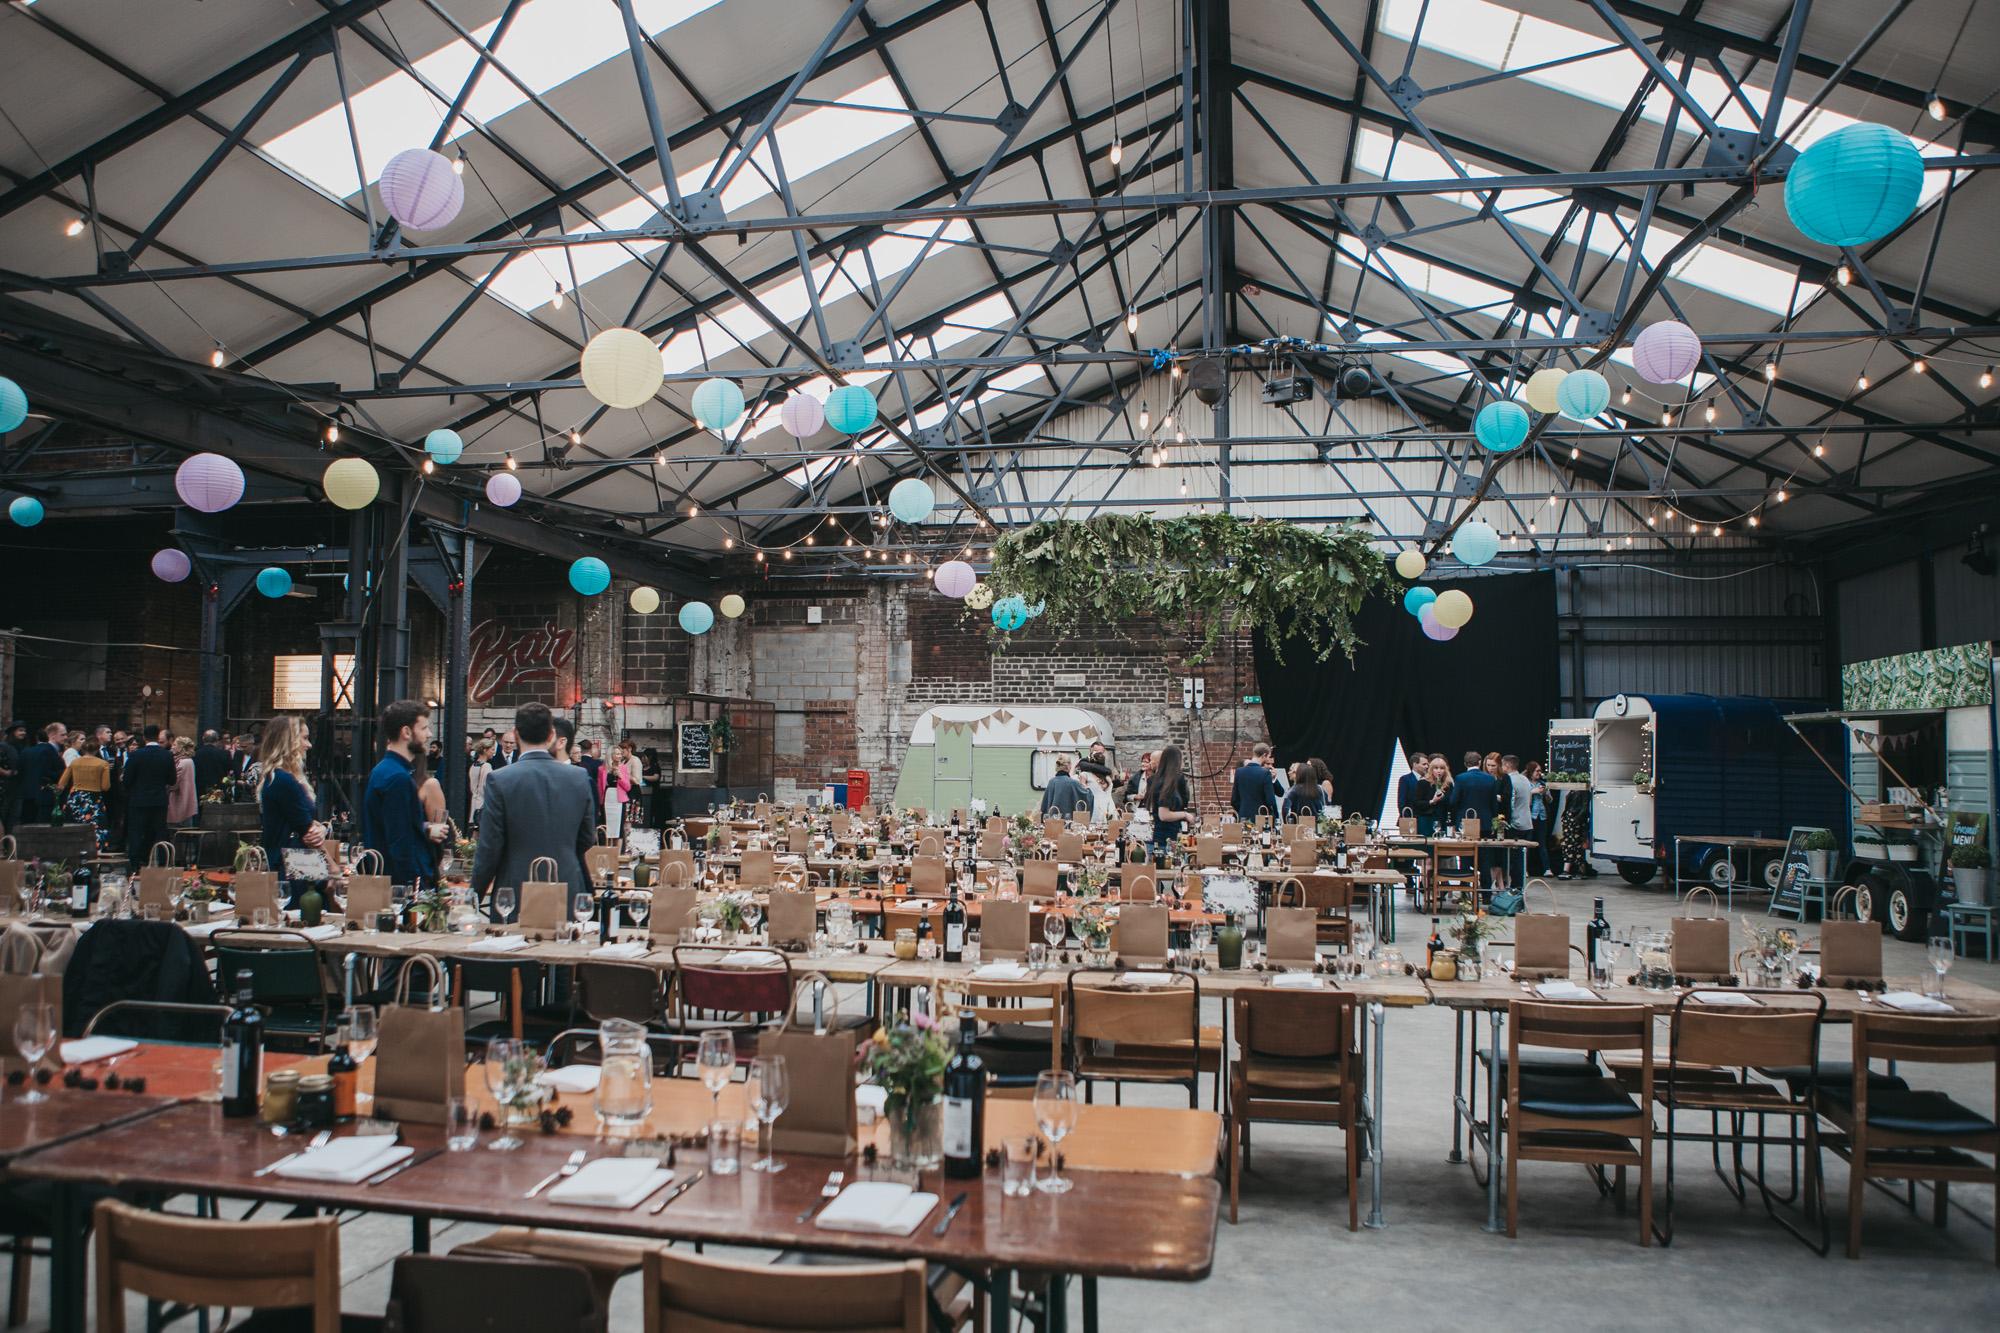 Kristy-Back-Garden-Outdoor-Wedding-Sheffield-Industrial-Warehouse-Wedding-Bohemian-Kate-Beaumont-Dahlia-Dress-38.jpg